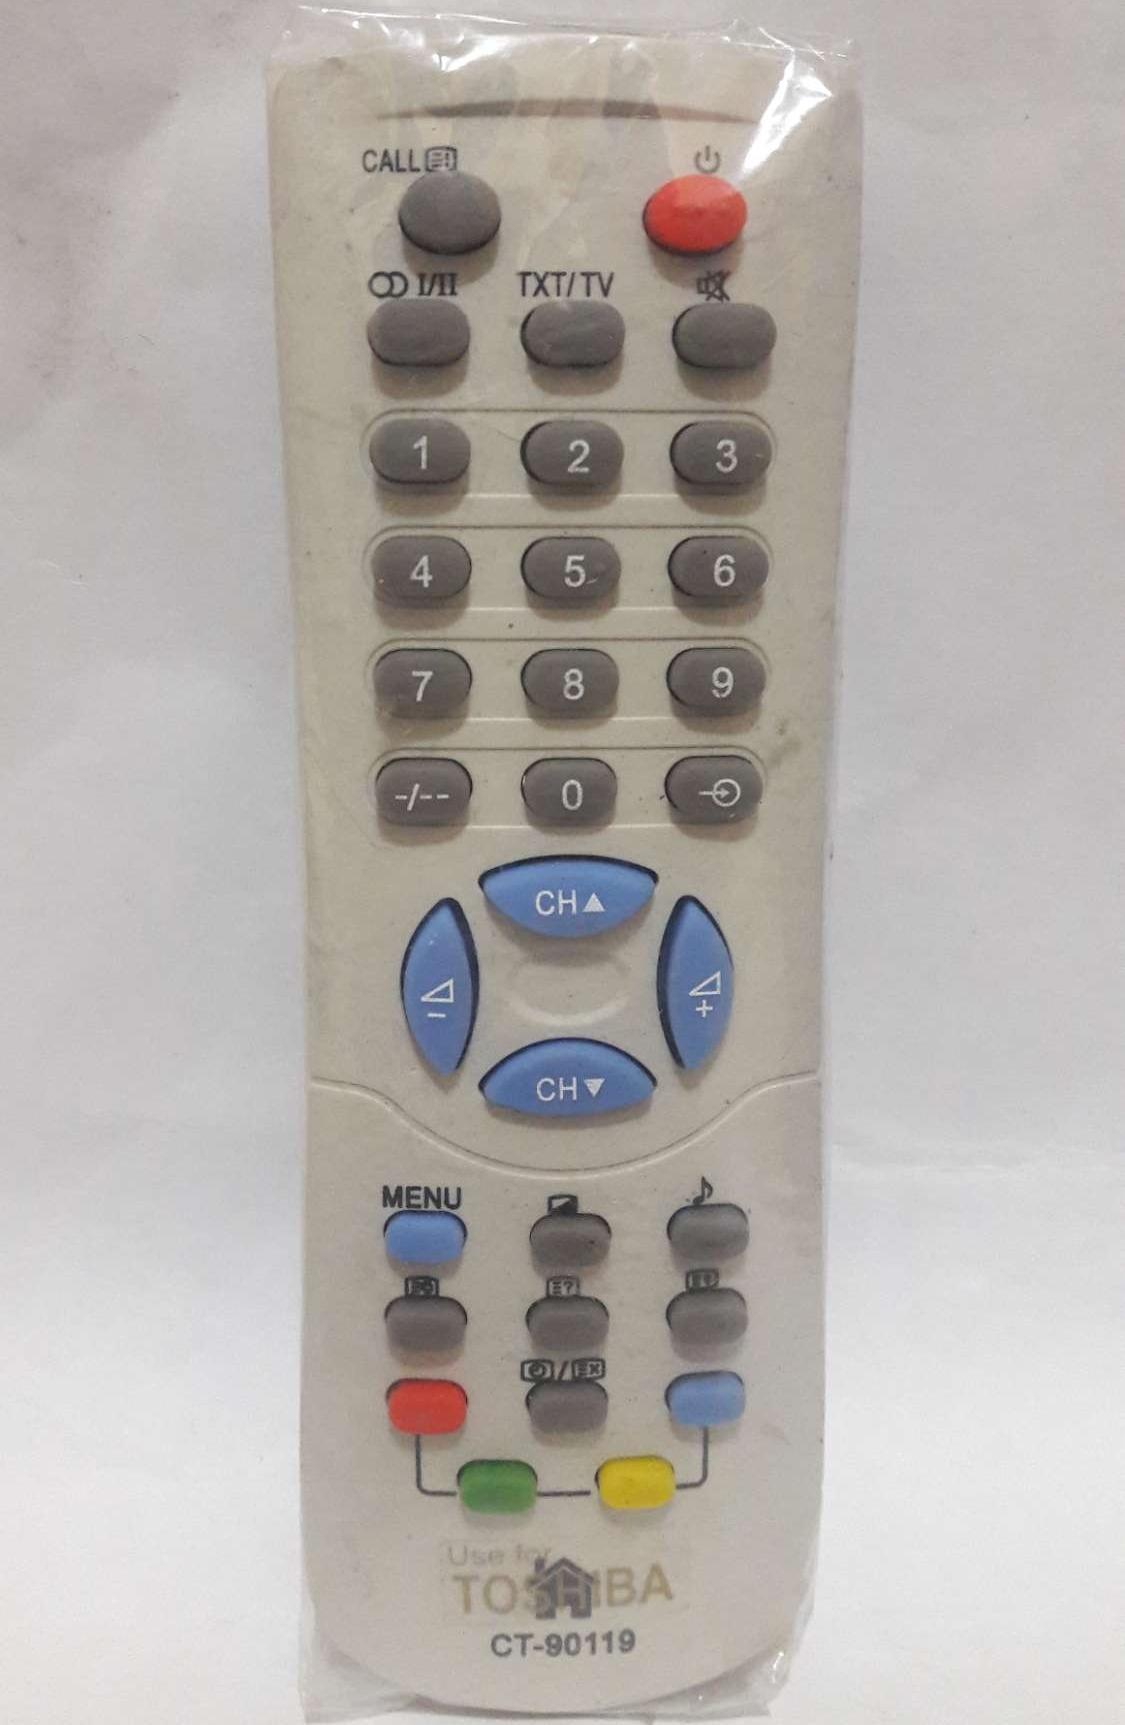 REMOTE TV TABUNG TOSHIBA